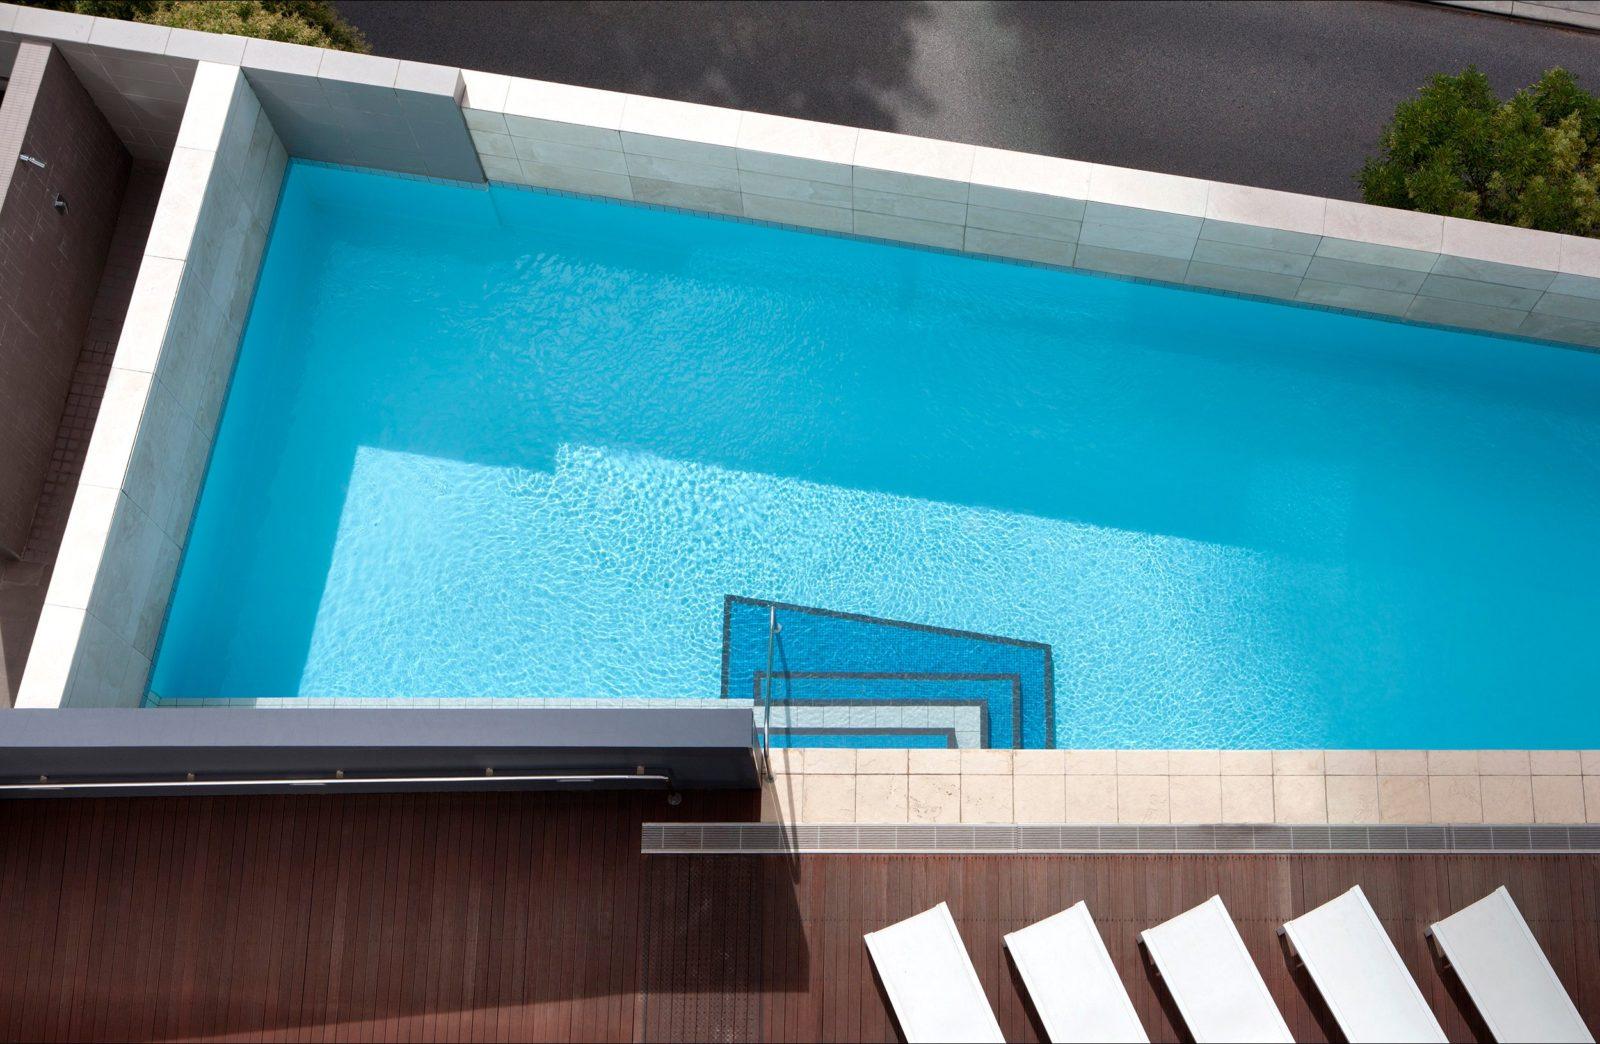 Adina Apartment Hotel Perth, Western Australia